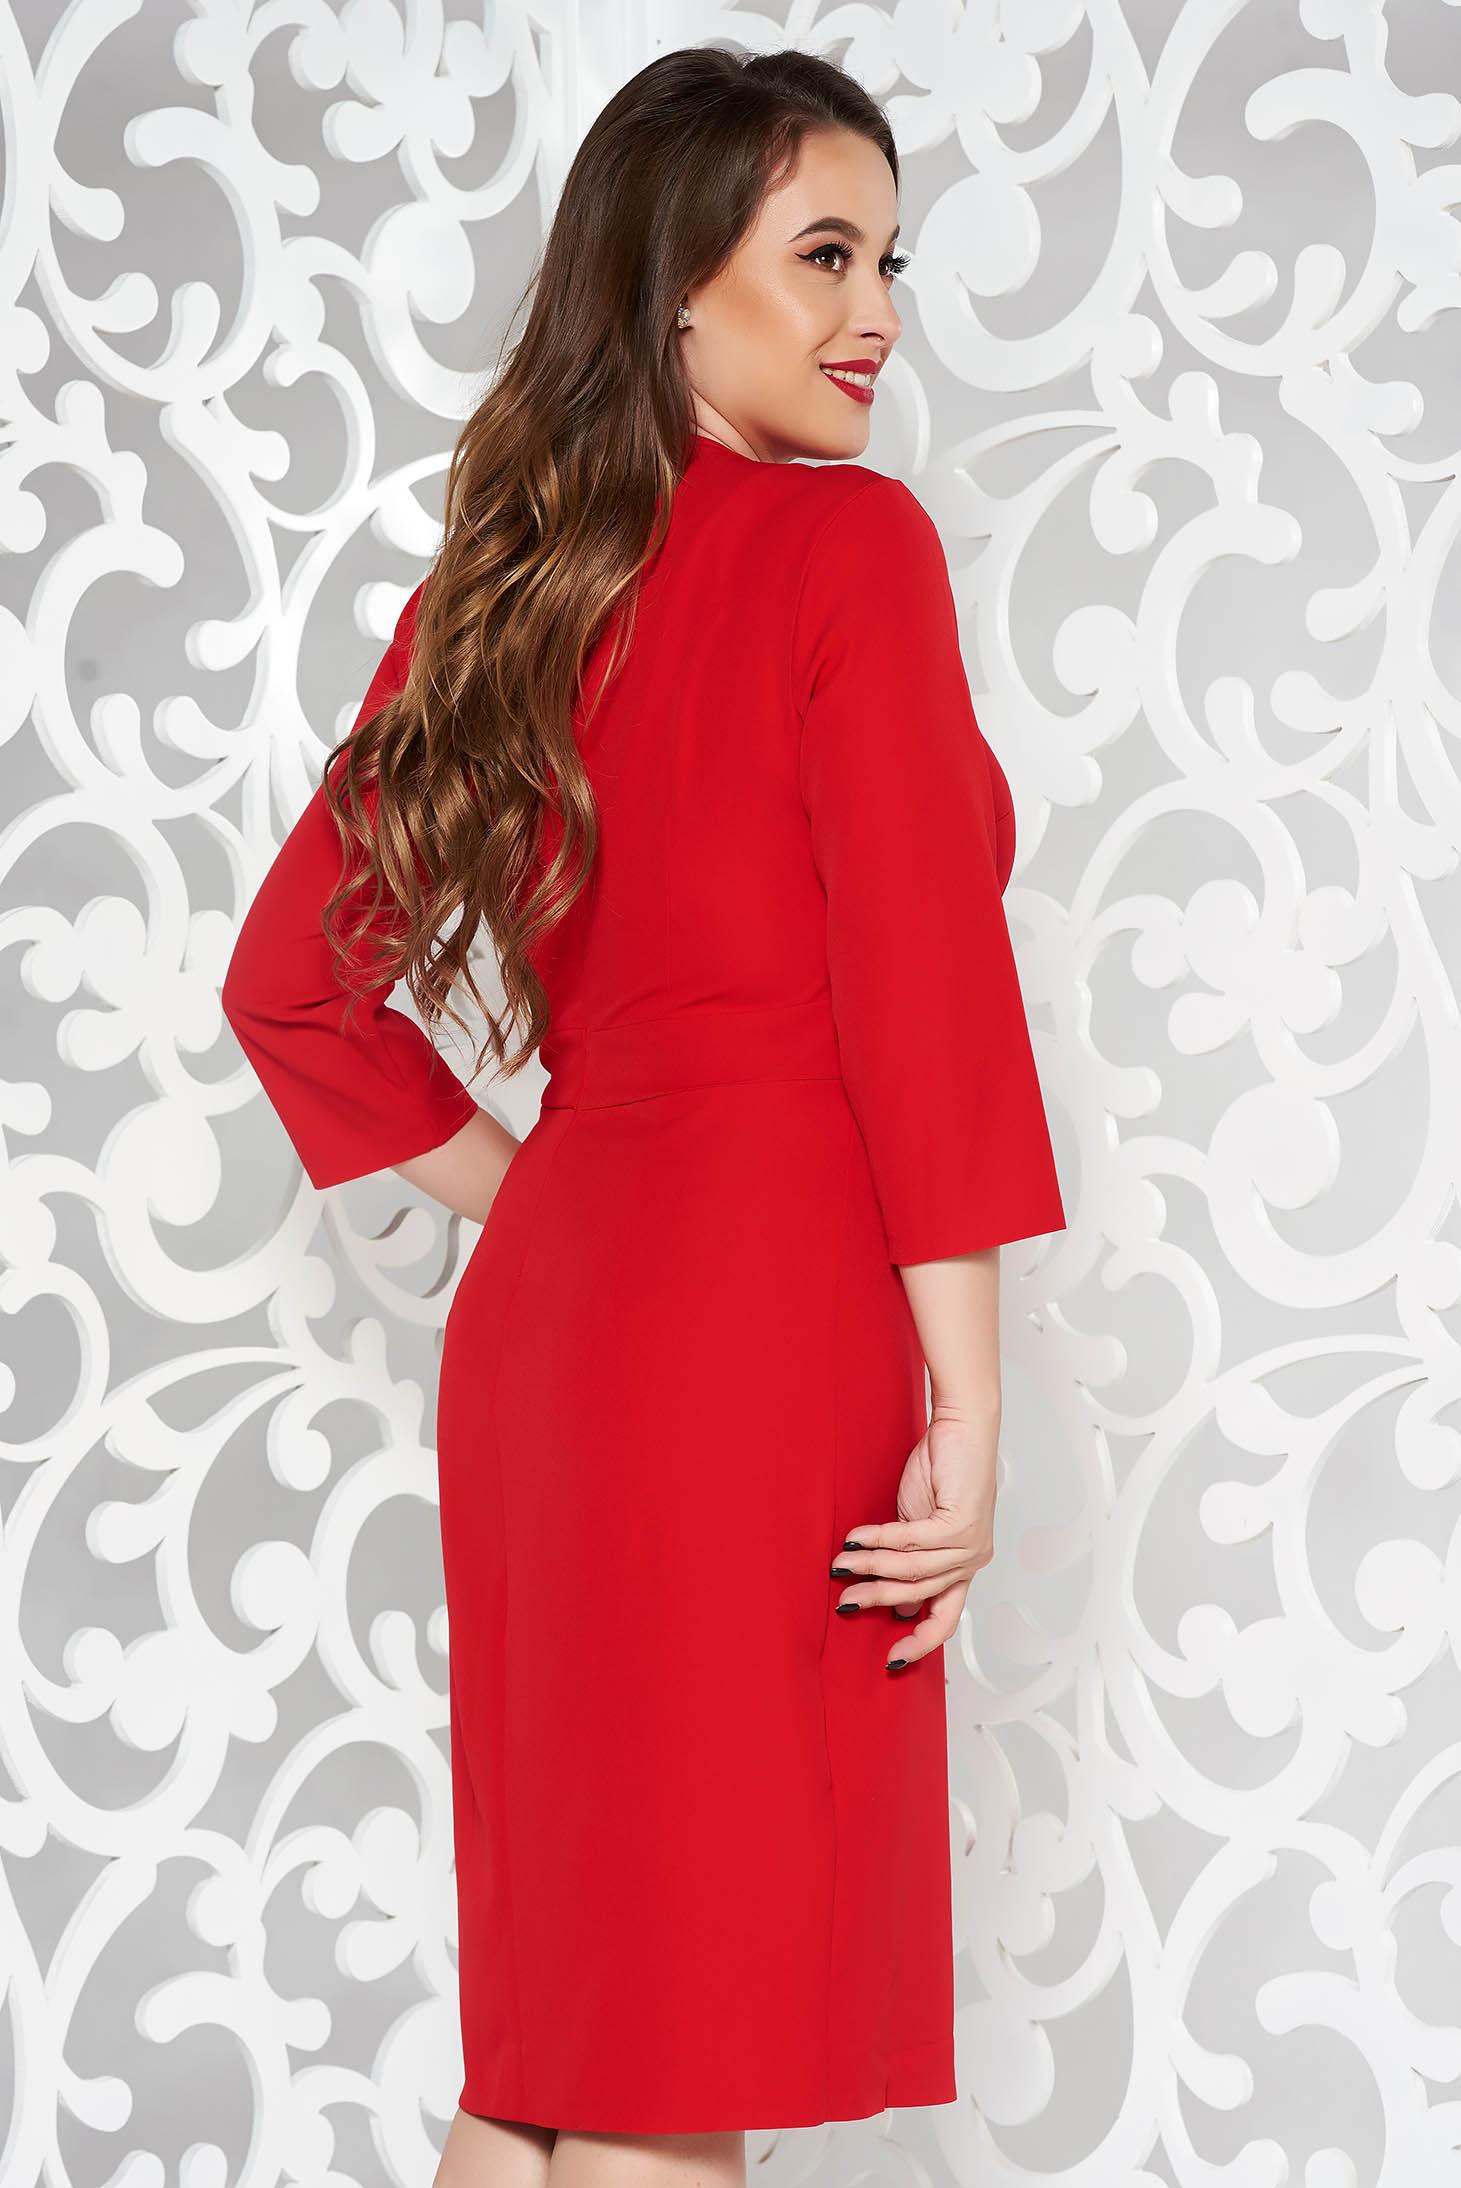 Rochie rosie eleganta tip creion din stofa subtire usor elastica accesorizata cu cordon